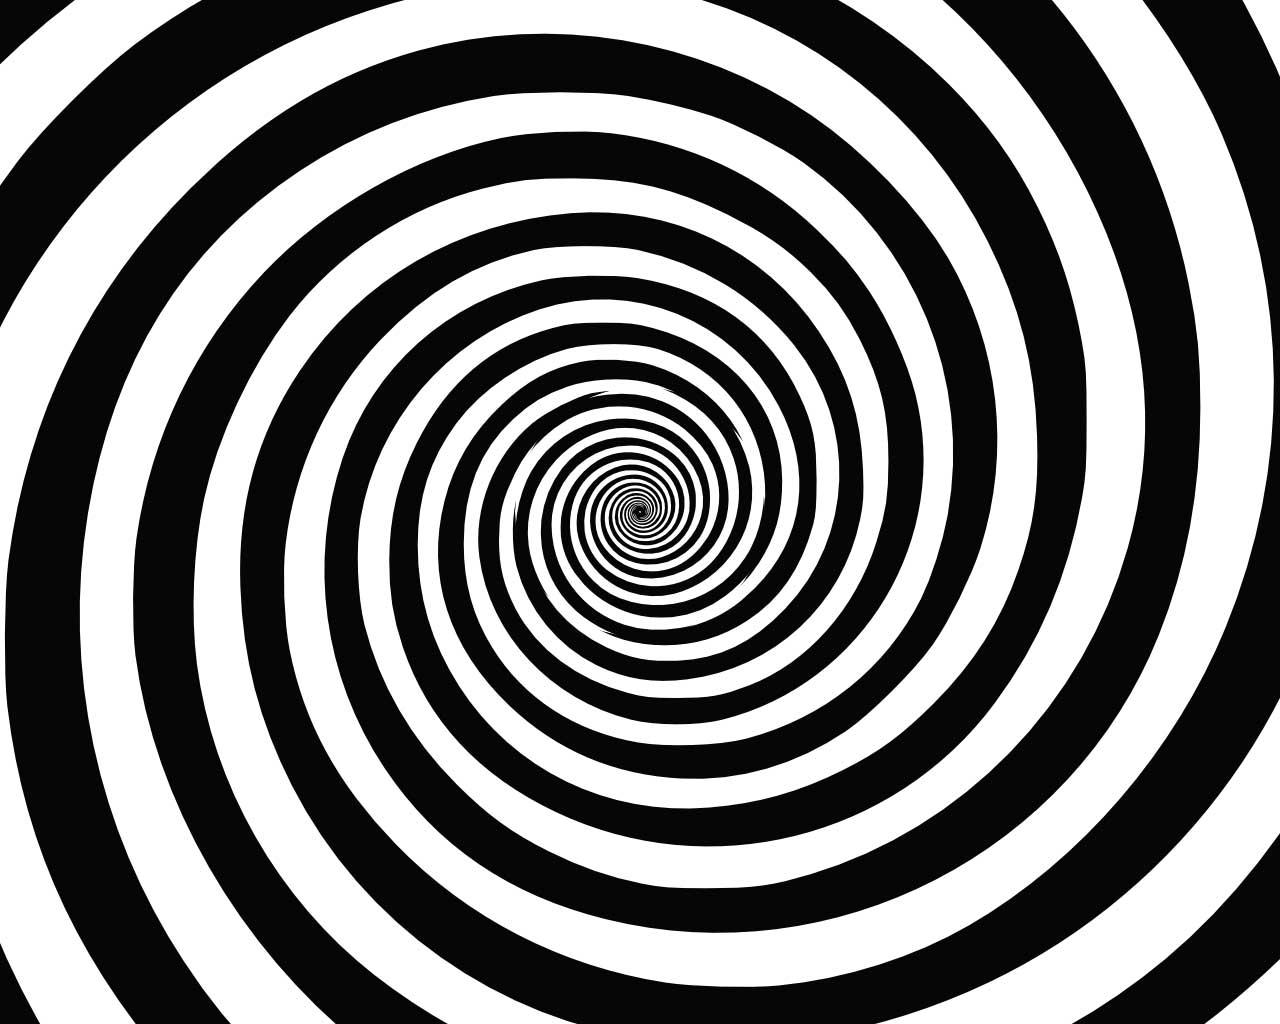 Free Spiral Vector, Download Free Clip Art, Free Clip Art